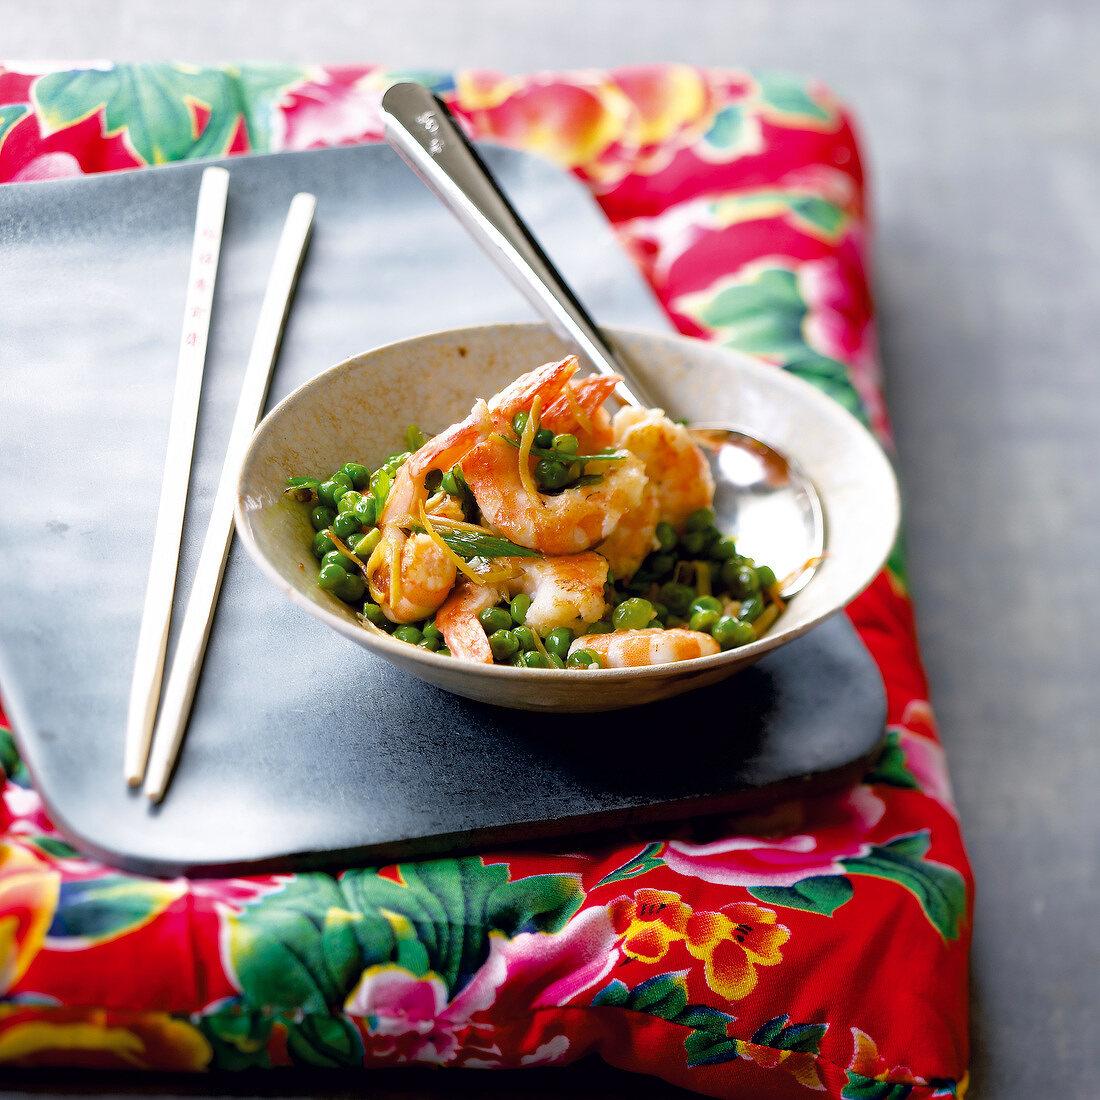 Sauteed shrimps and peas